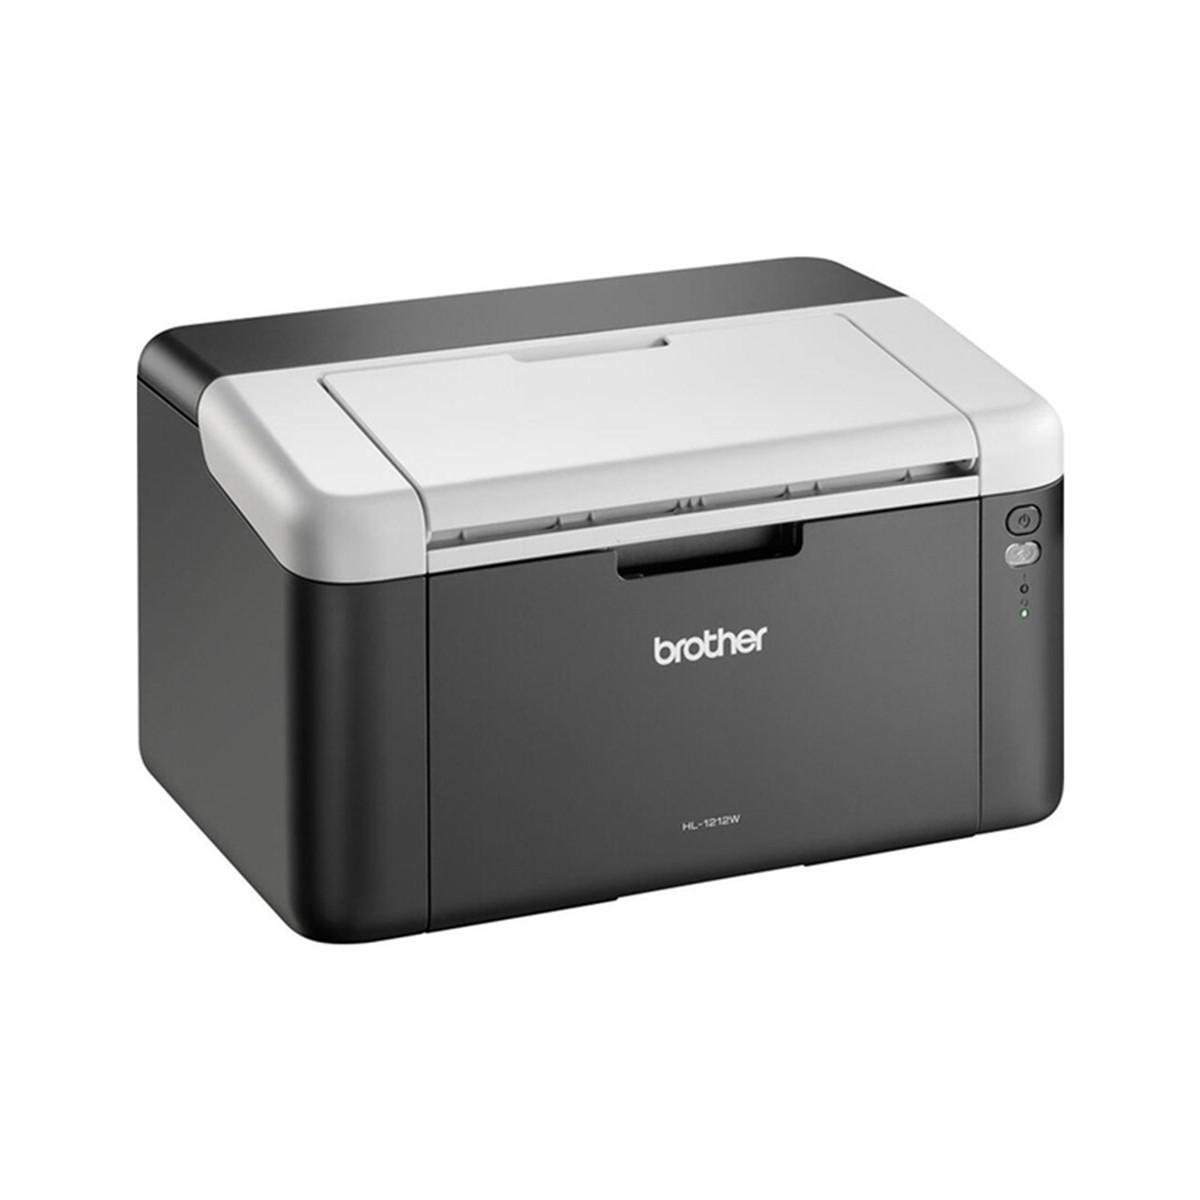 Impressora Brother HL-1212W HL1212 Laser Monocromática com Wireless